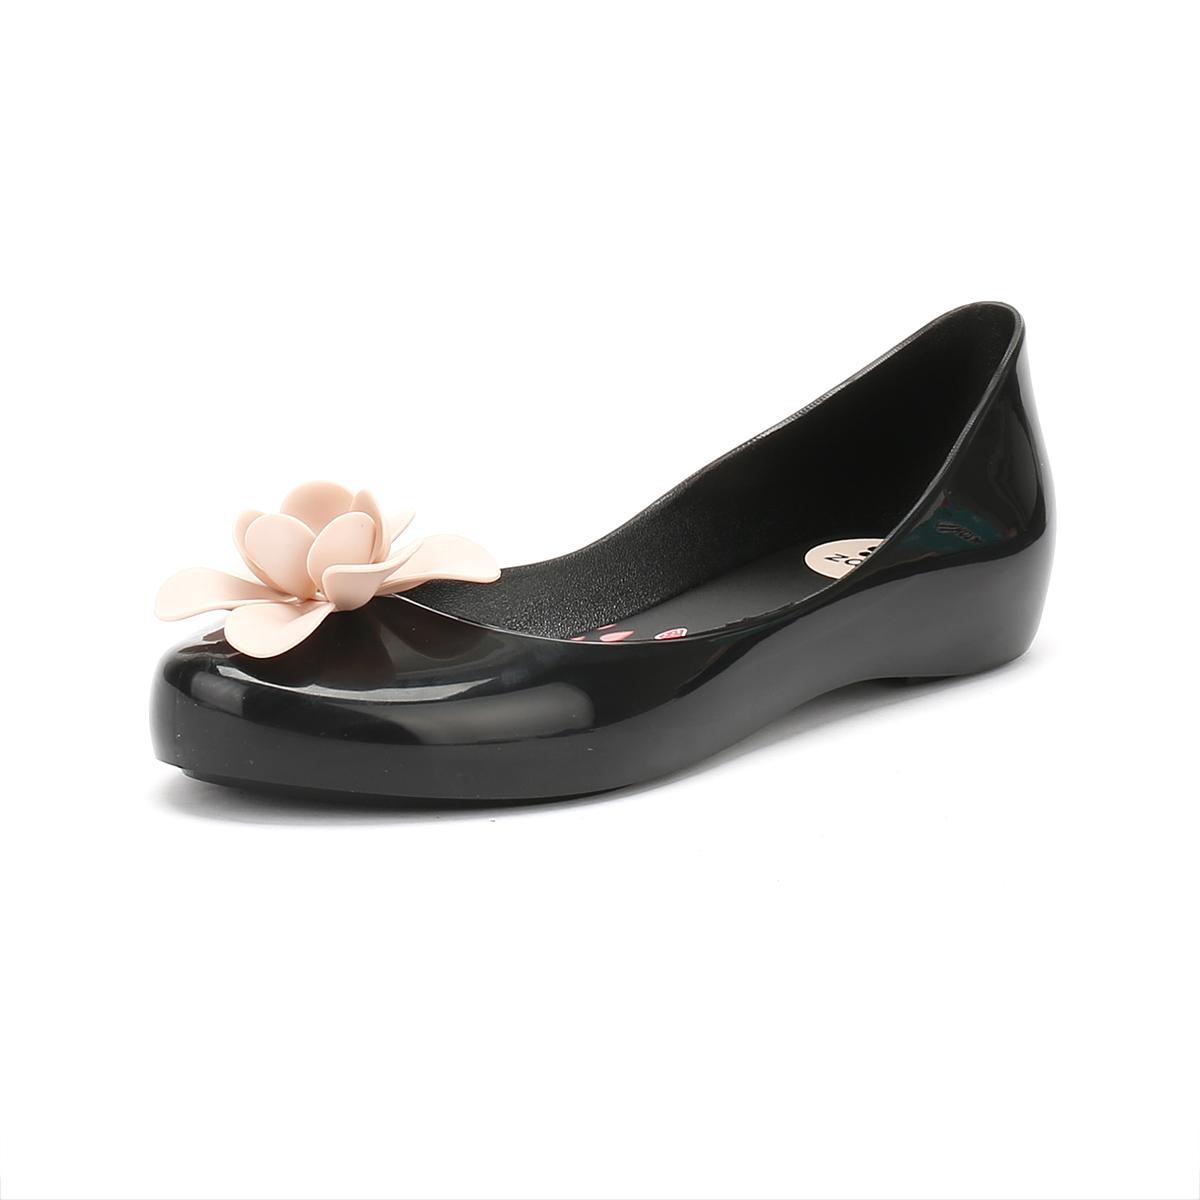 Zaxy Shoes Black